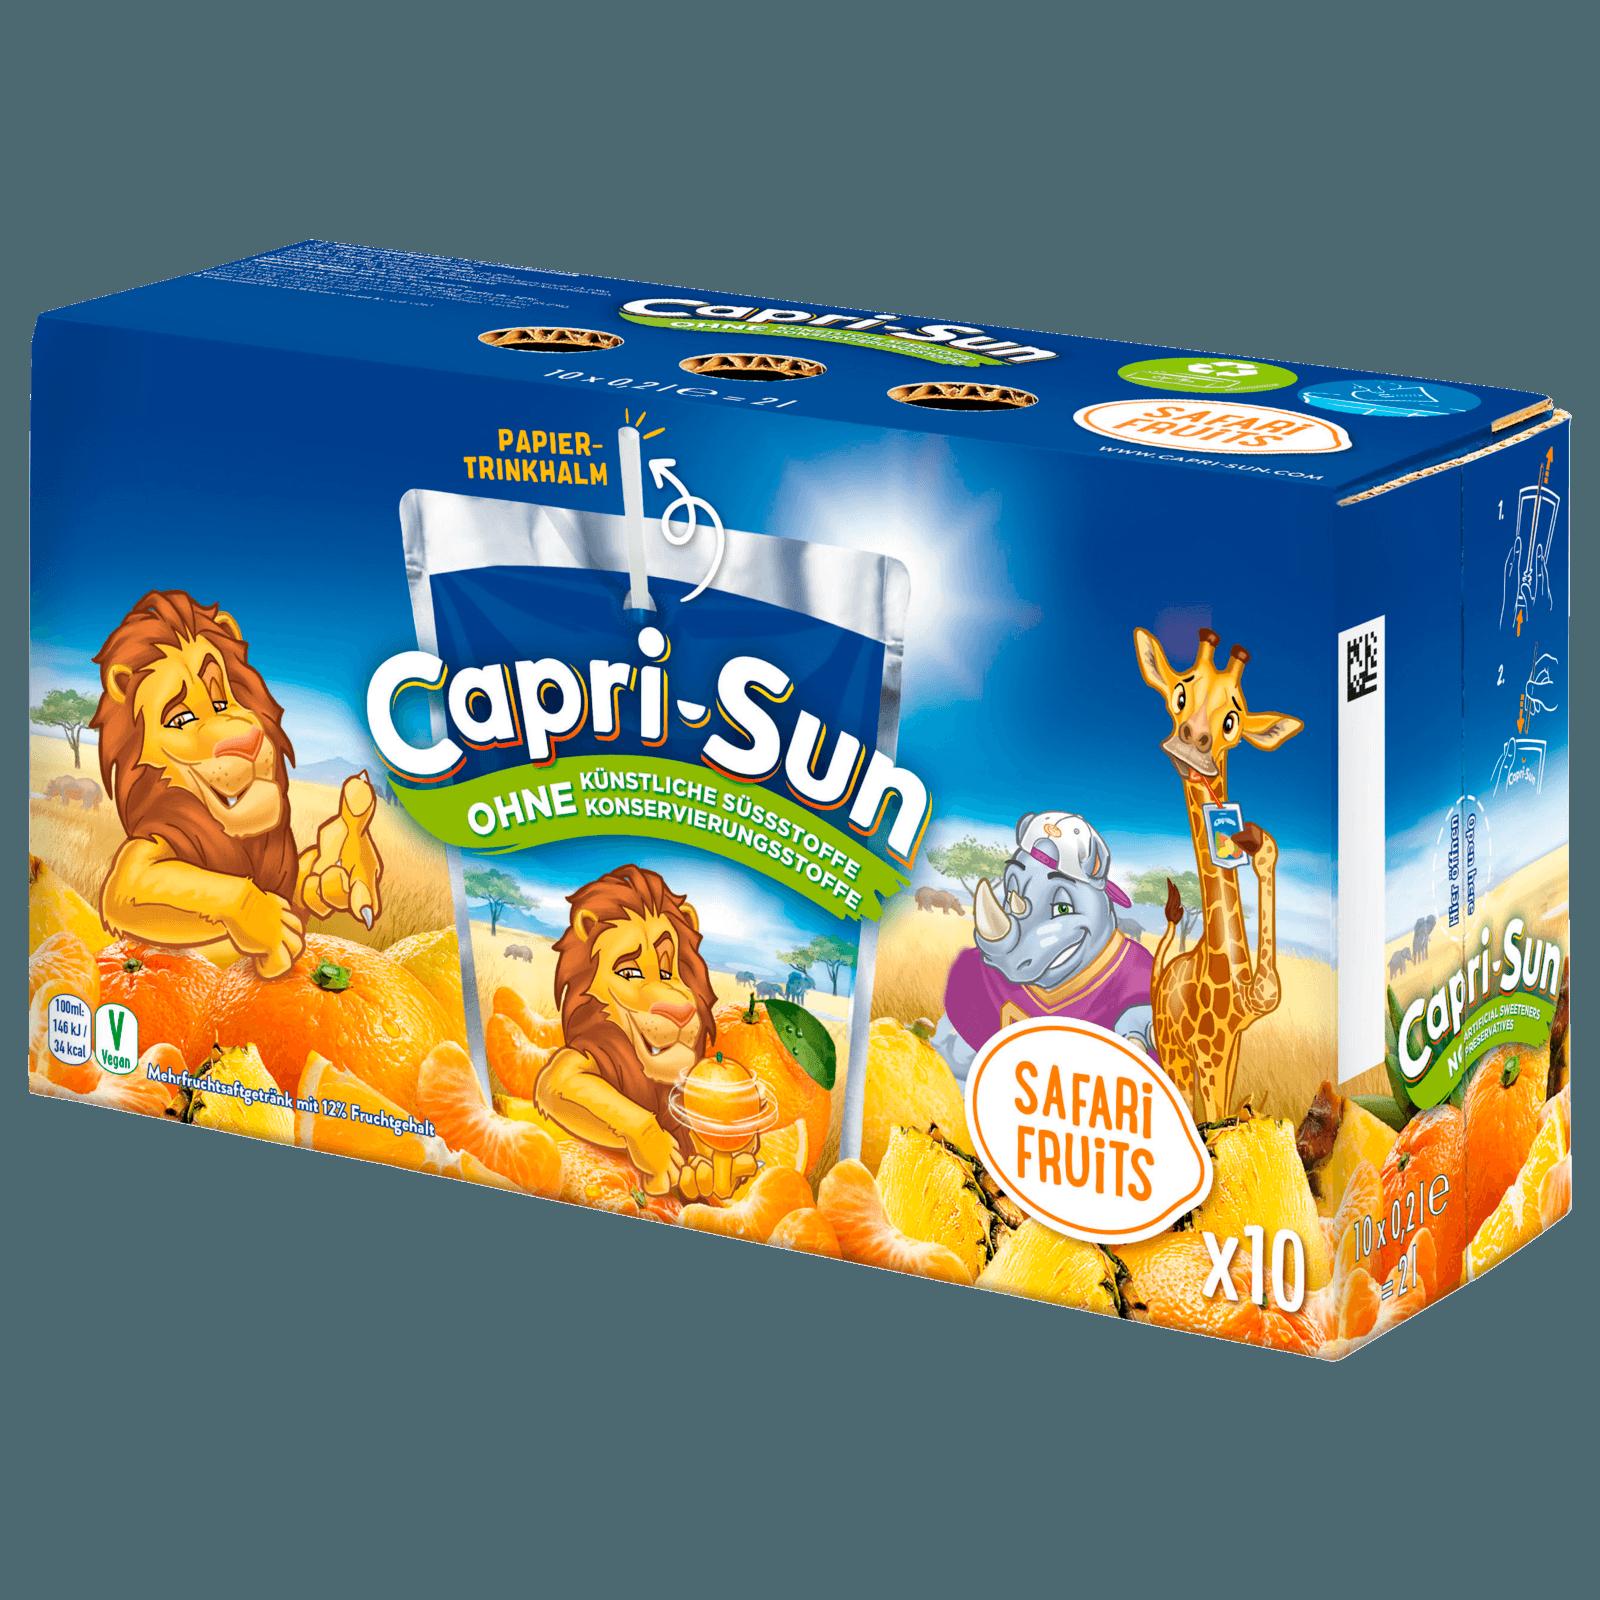 Capri Sun Safari Früchte Multipack 20x20ml bei REWE online bestellen